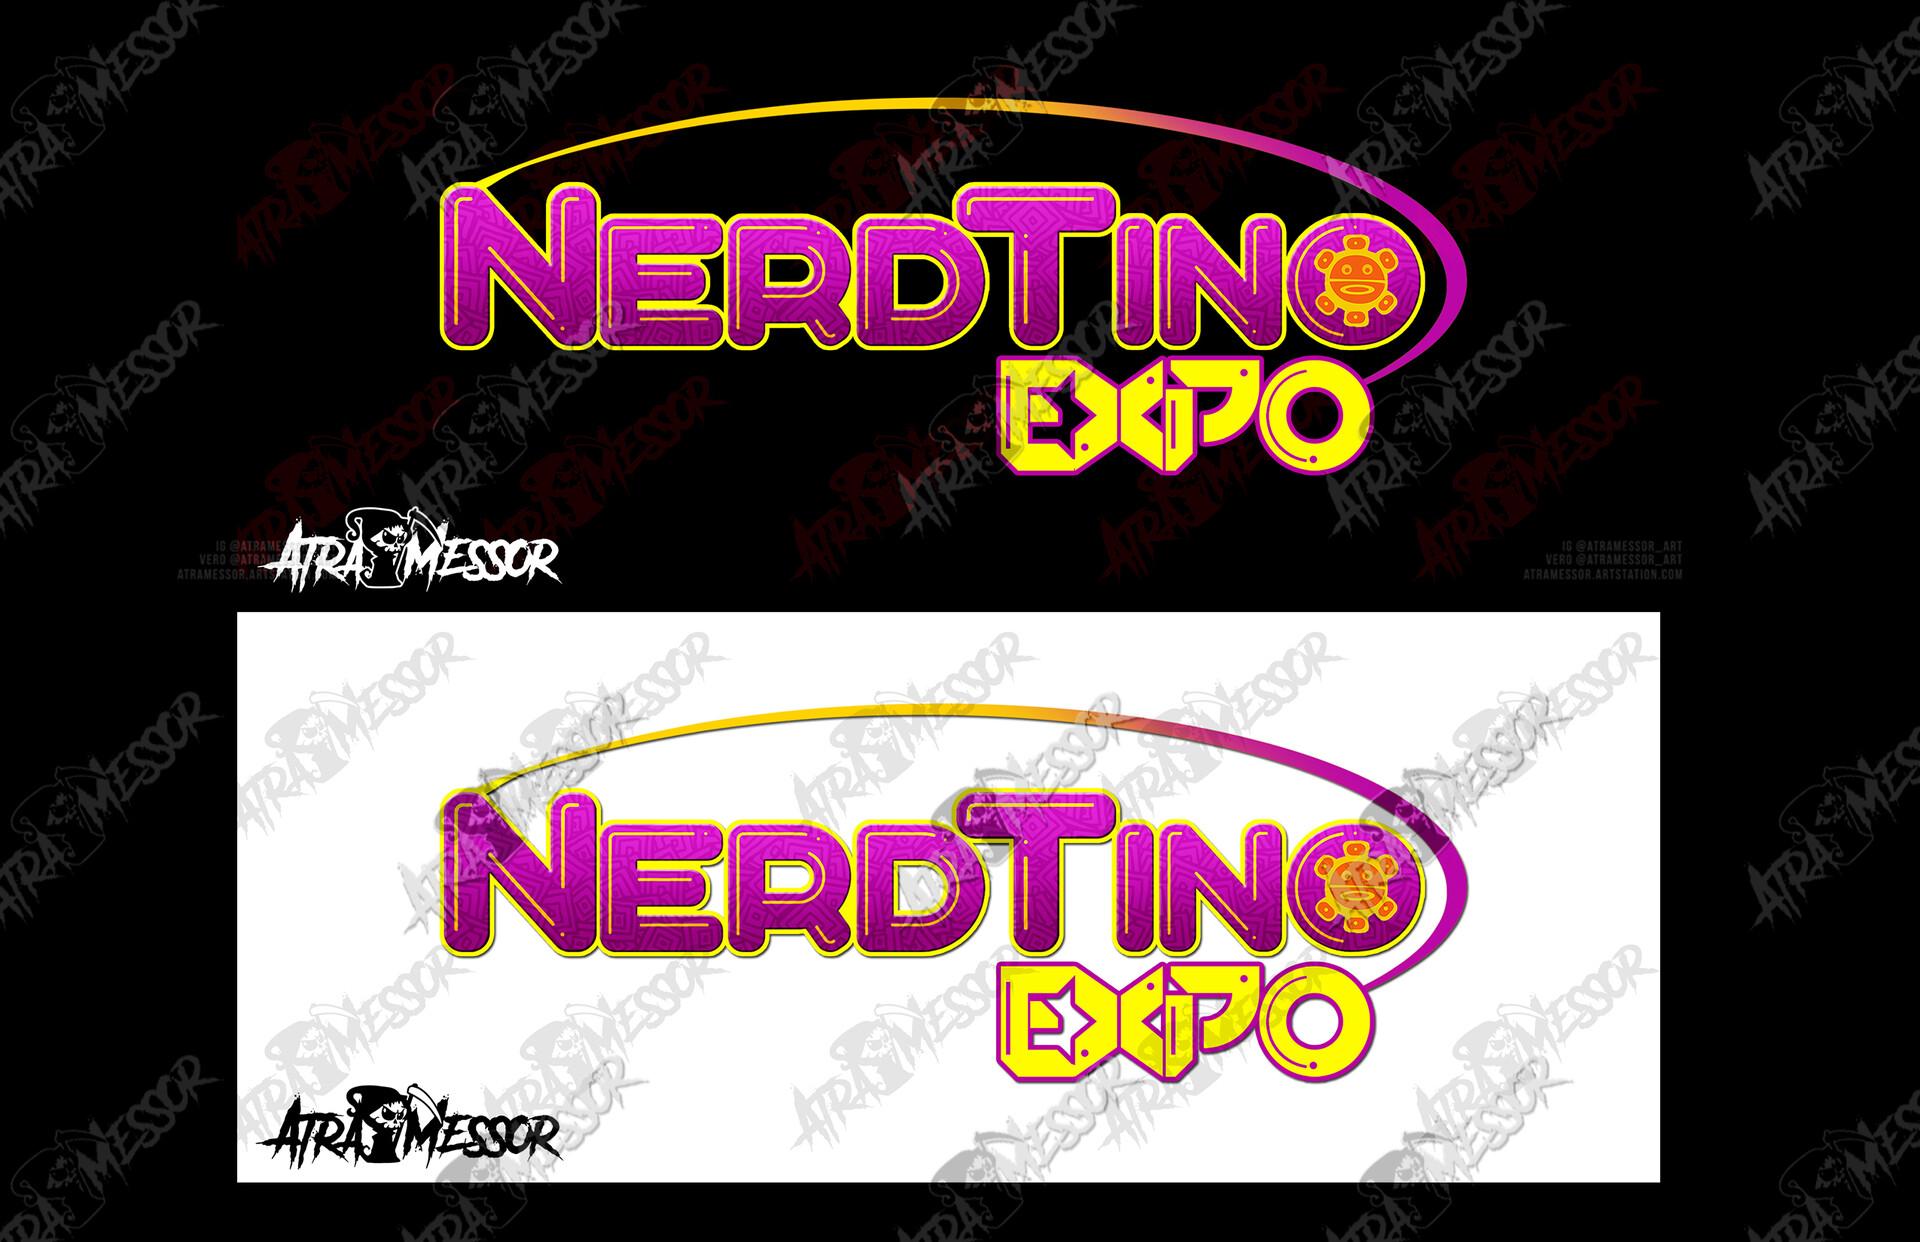 Nerdtino Expo Logo (commission)